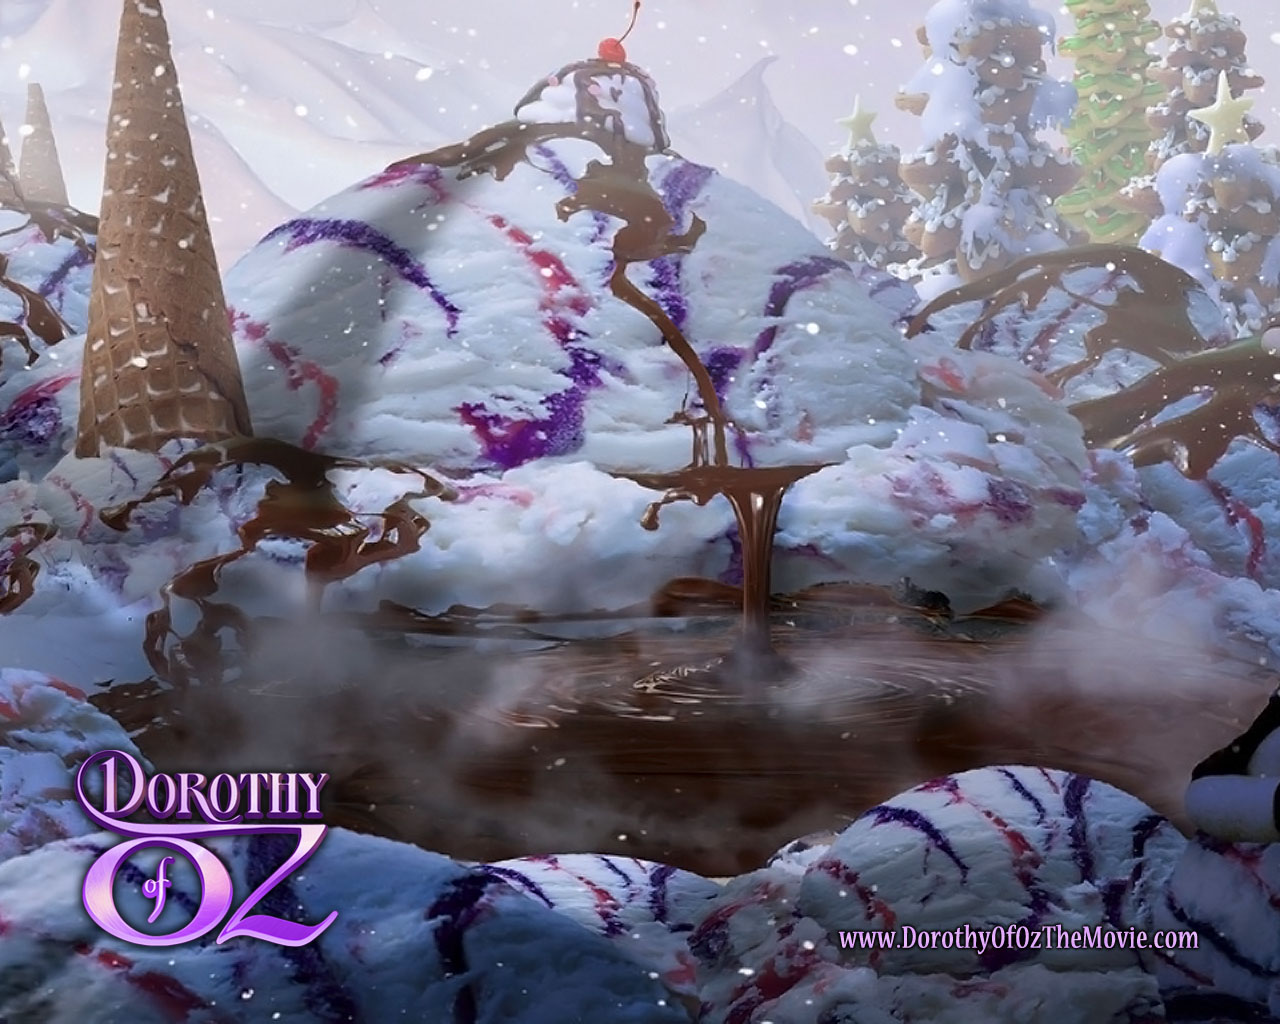 http://st-im.kinopoisk.ru/im/wallpaper/1/5/3/kinopoisk.ru-Legends-of-Oz_3A-Dorothy_27s-Return-1533897--w--1280.jpg